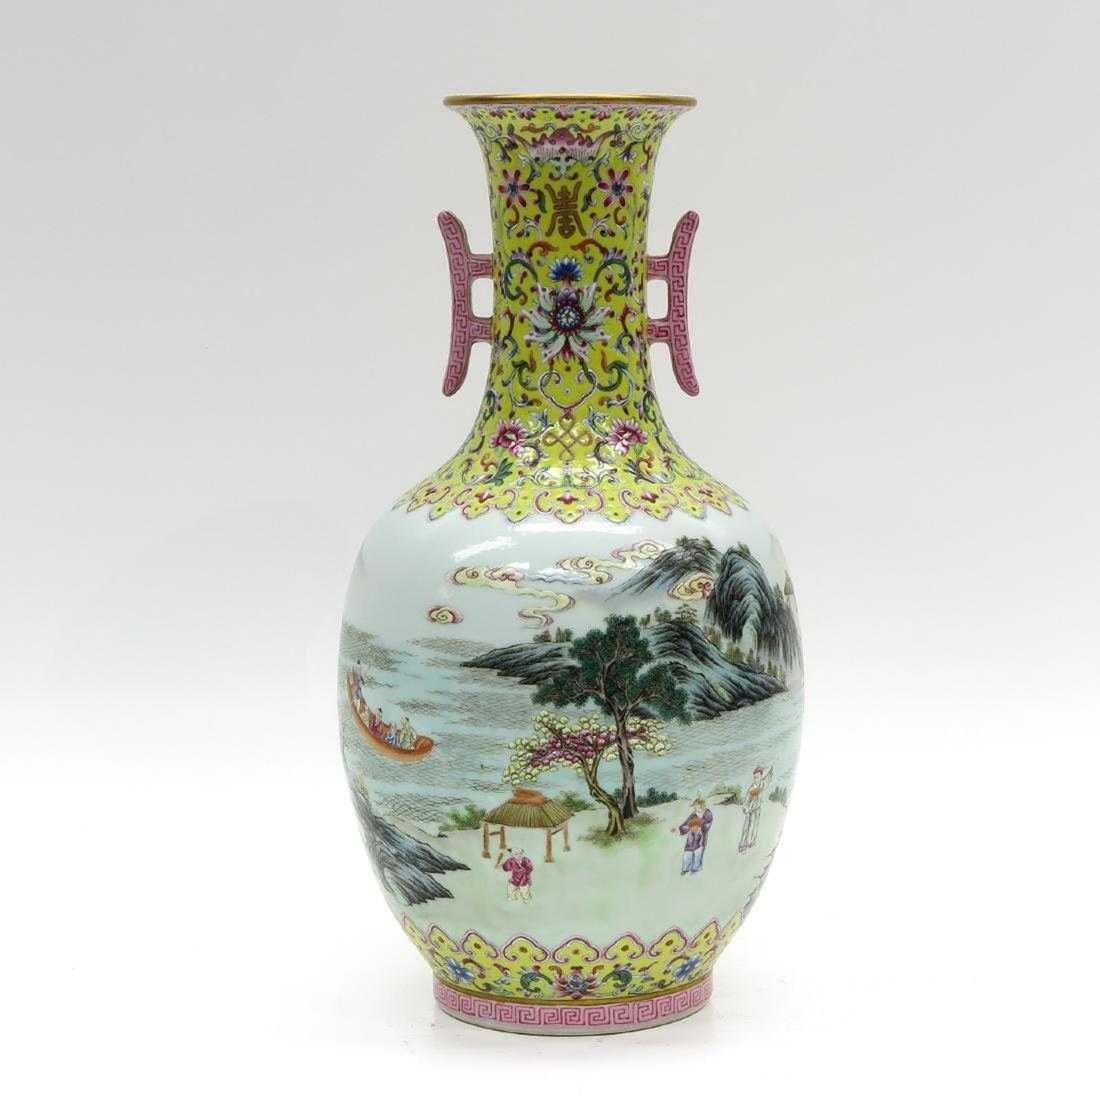 Chinese Famille Rose Enamel Decor Vase - 3